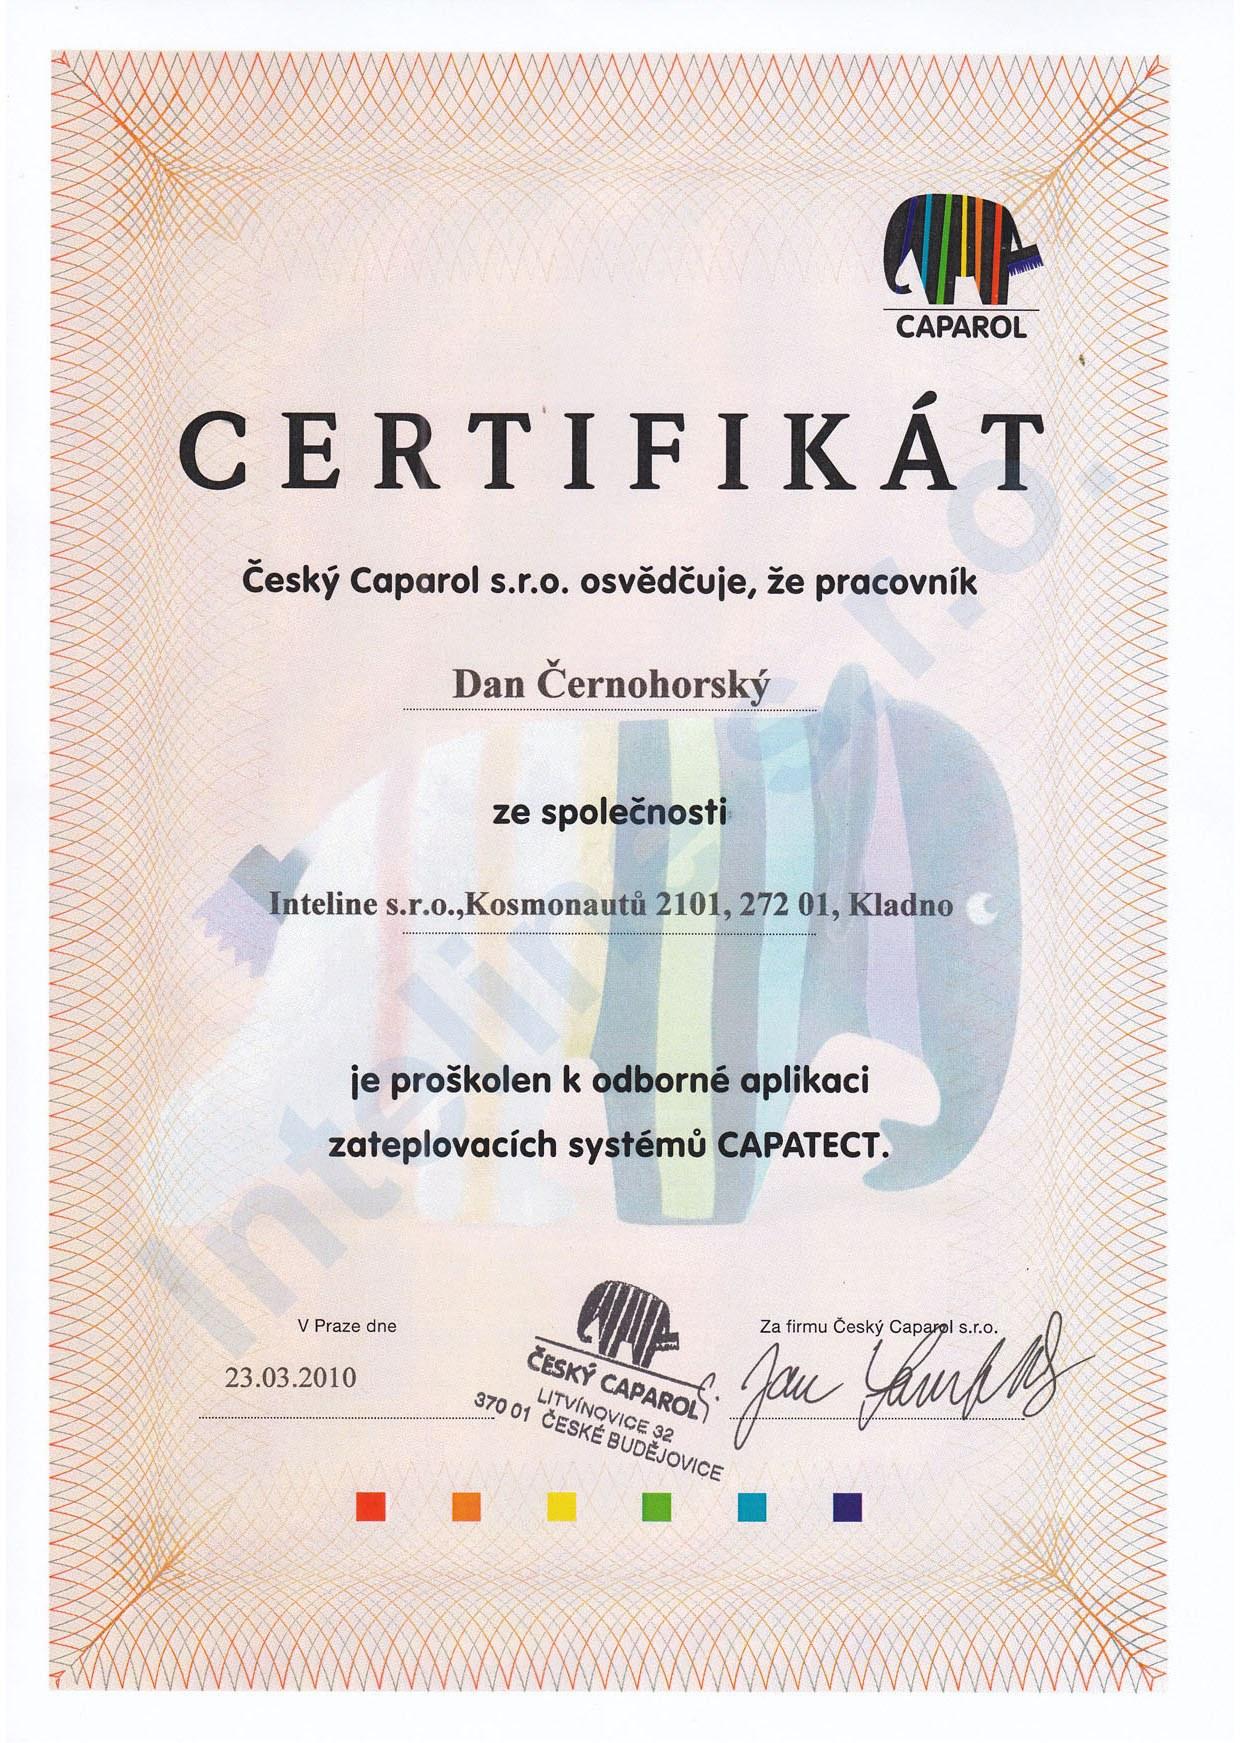 Certifikát Caparol Capatect